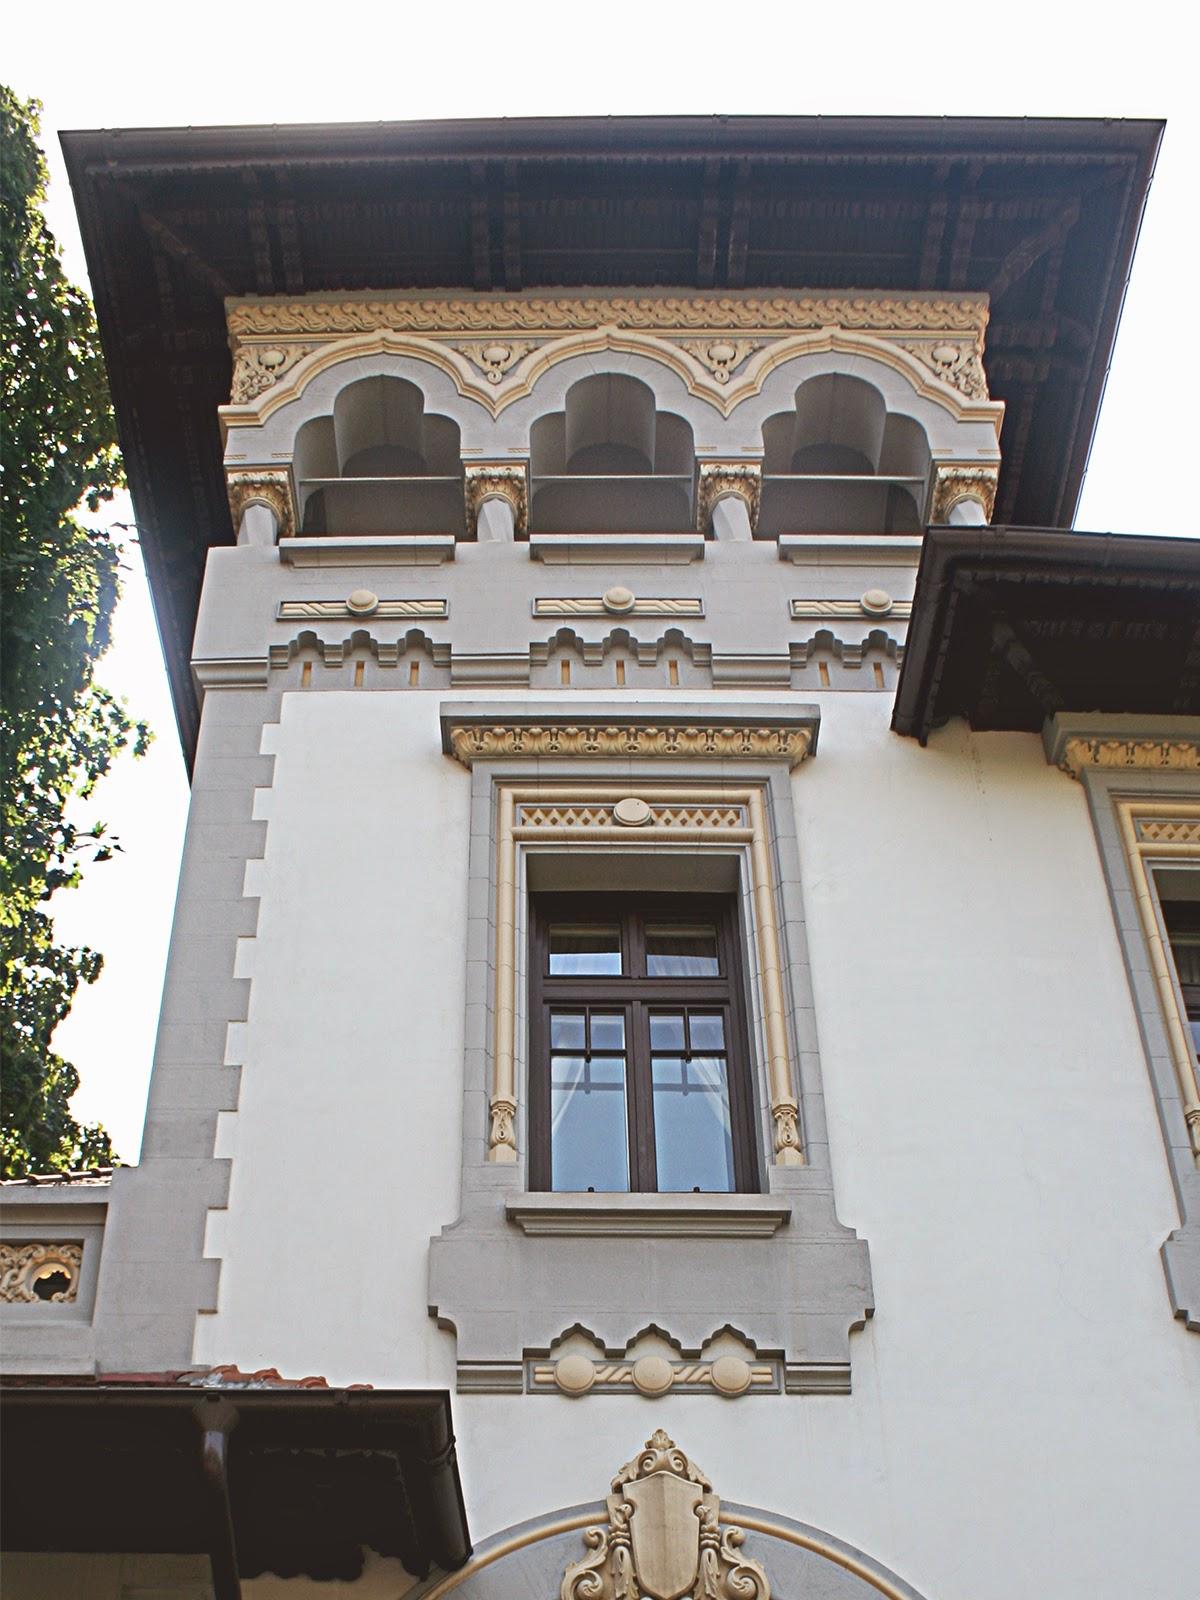 casa in stil neoromanesc cu ornamente arhitecturale din polistiren